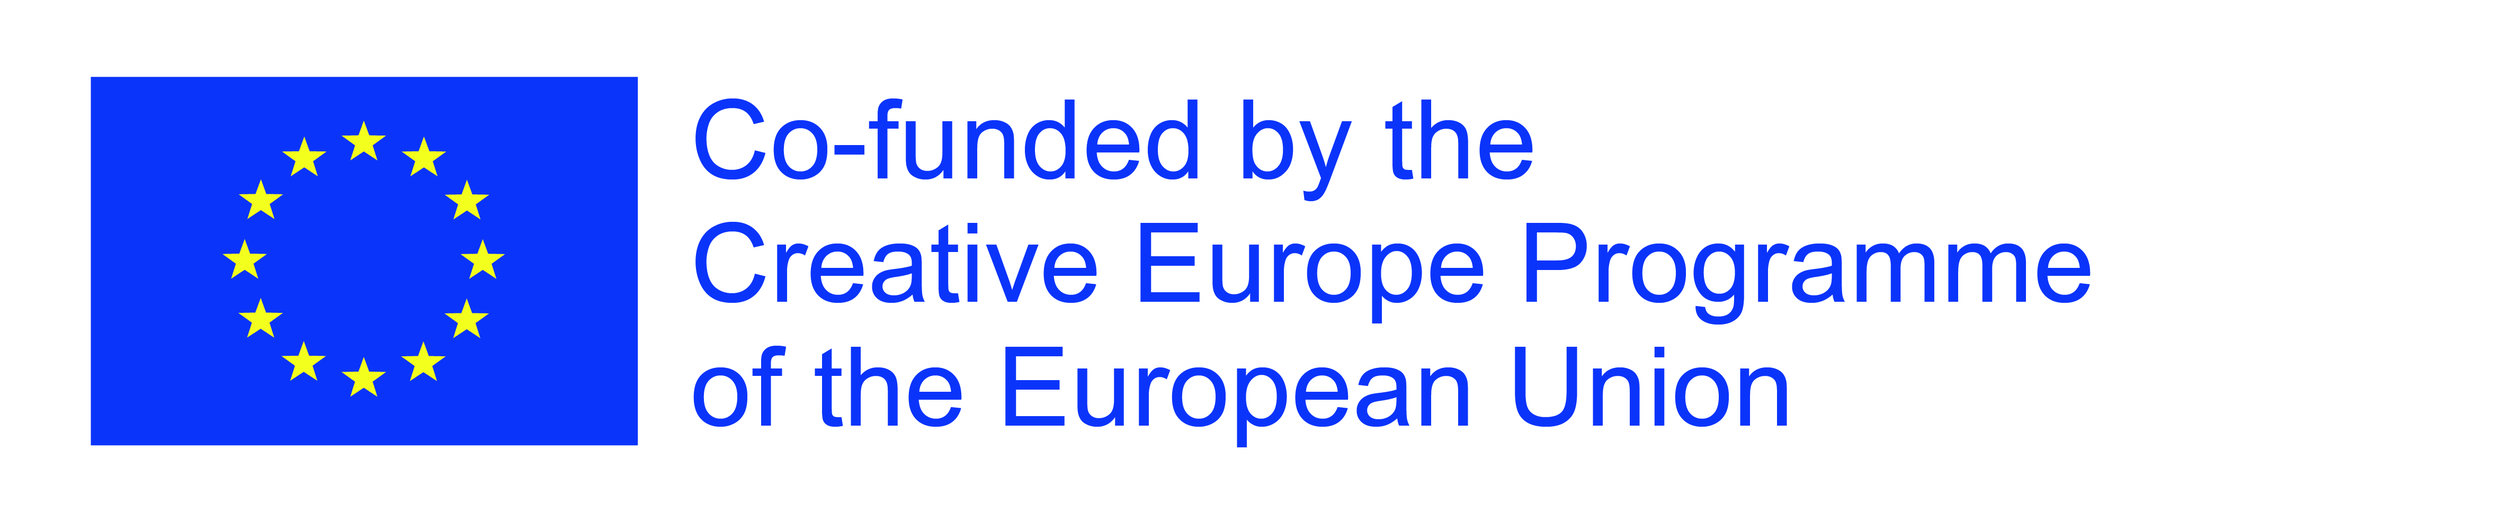 logosbeneficairescreativeeuroperight_en.jpg